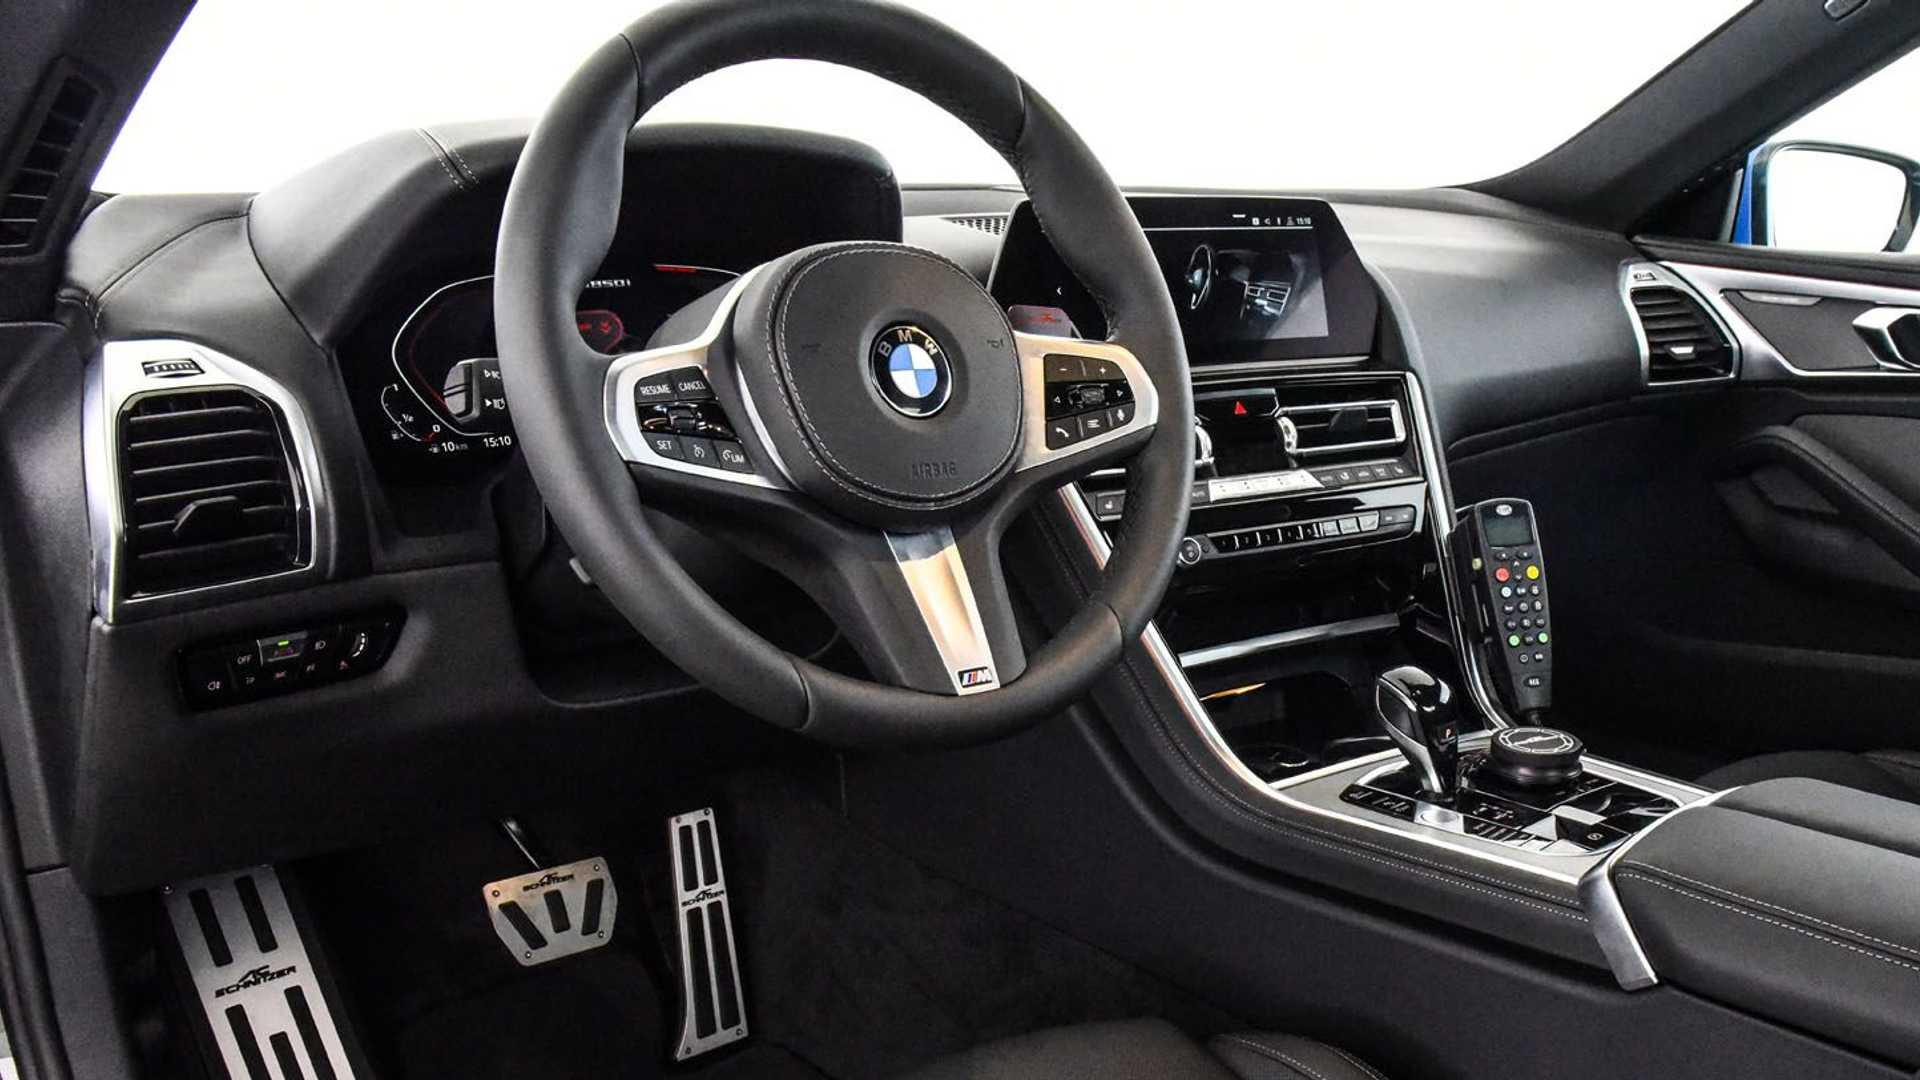 BMW-M850i-police-car-tune-it-safe-42